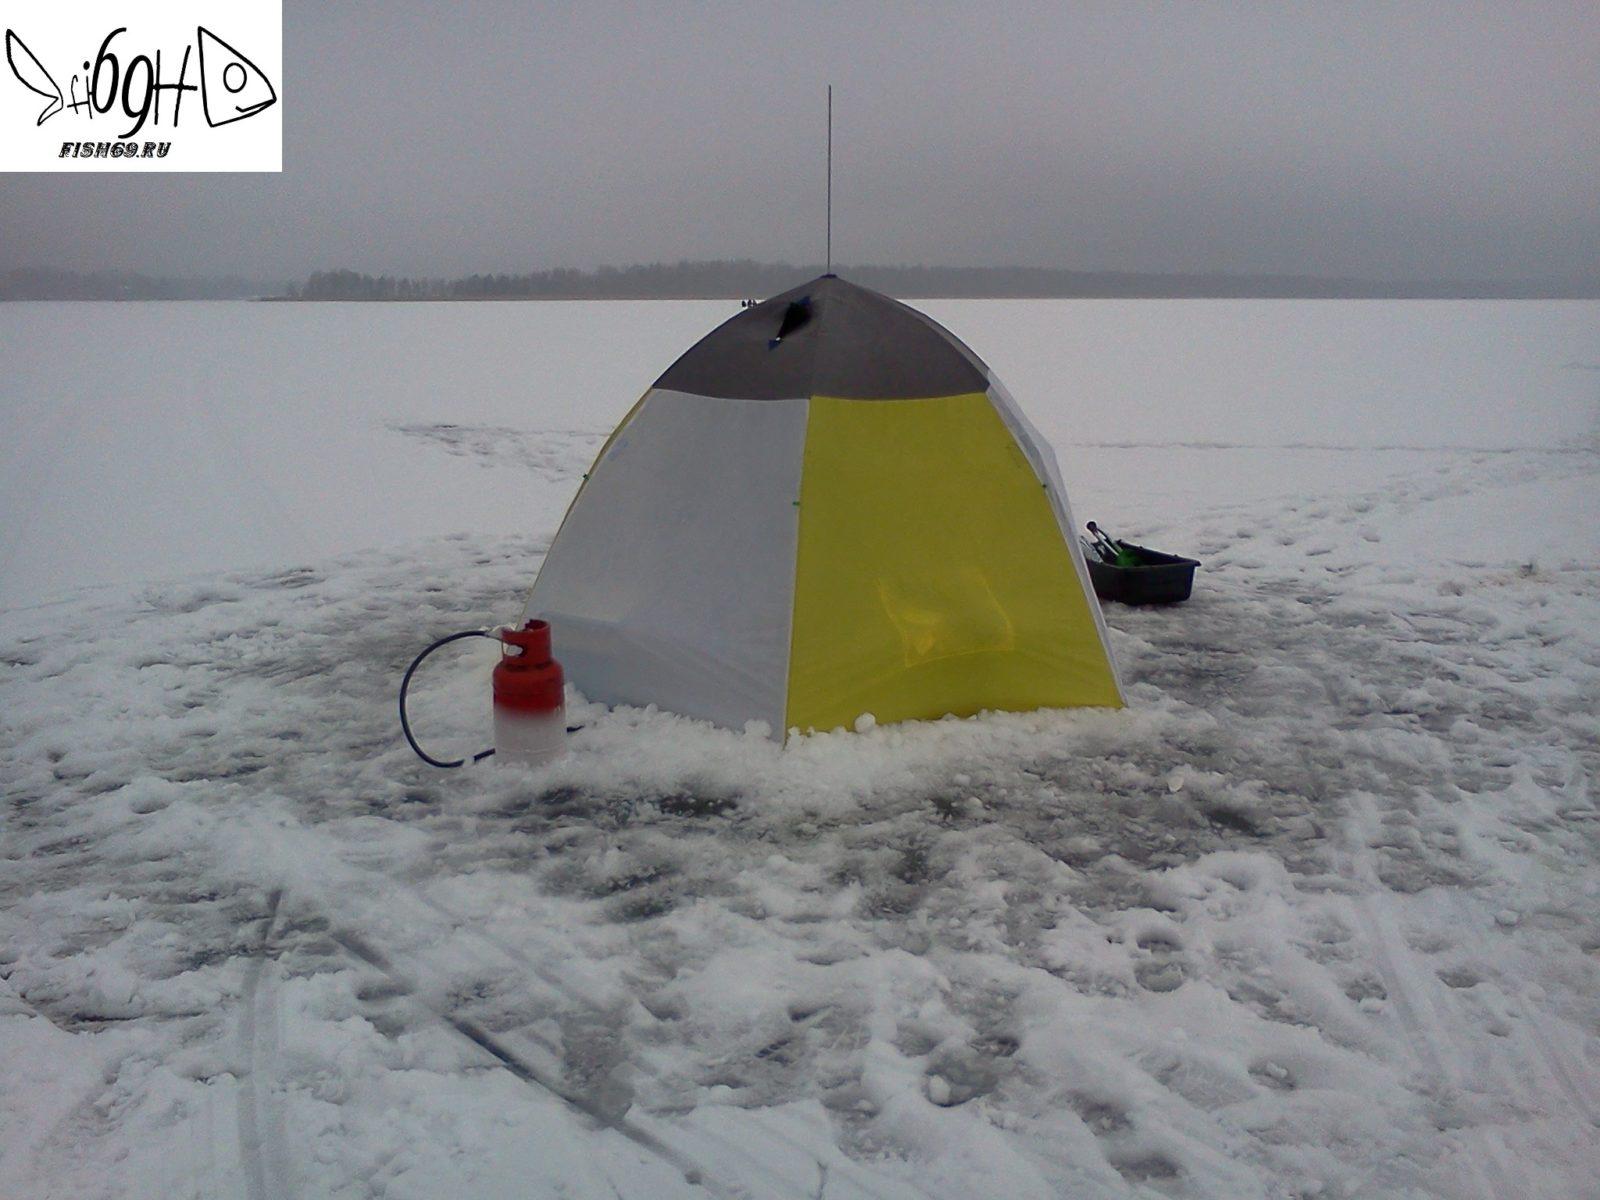 рыбалка на озере сиг 2016 год